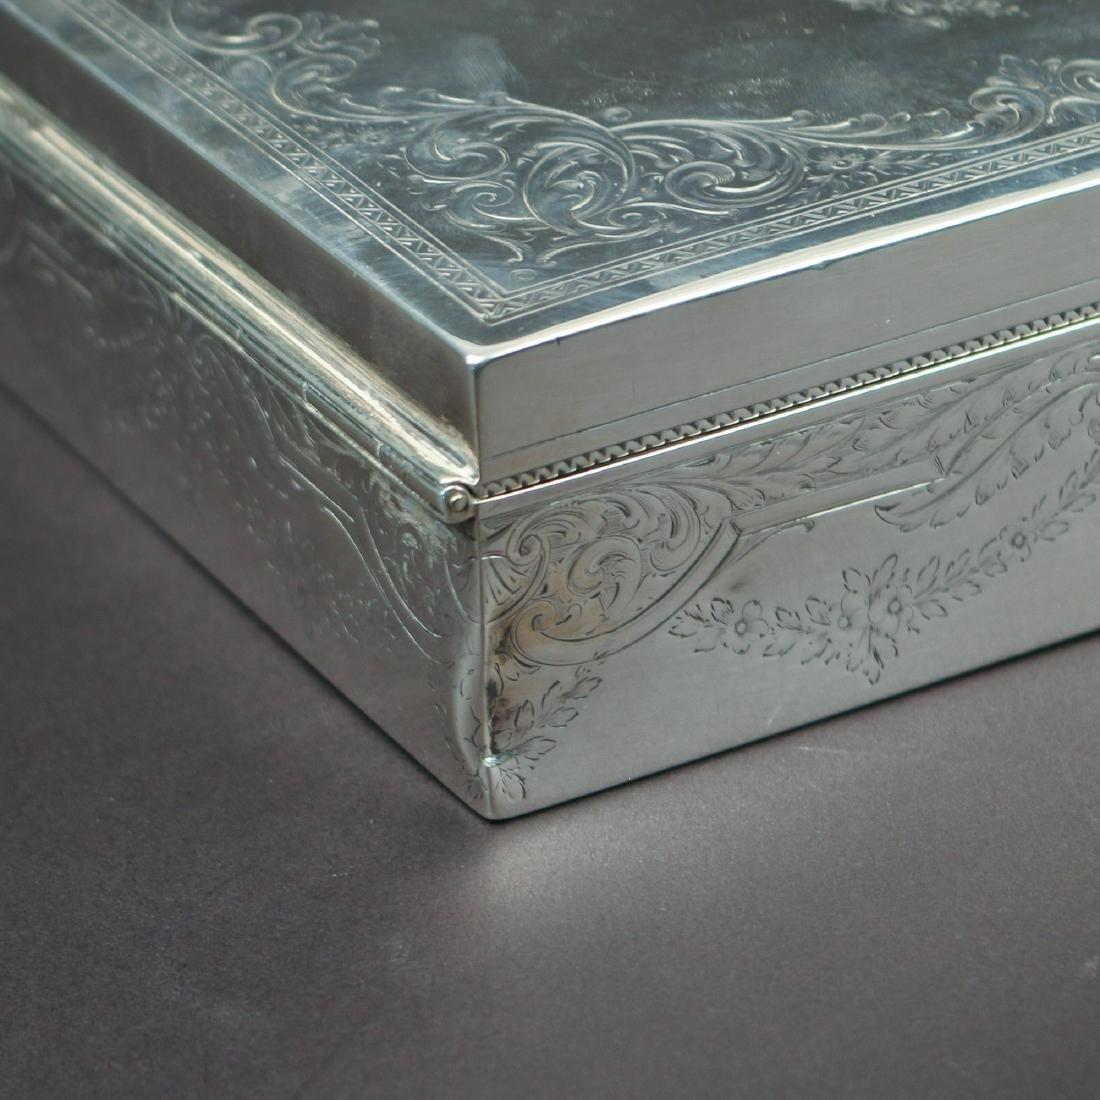 HOWARD & CO. STERLING SILVER JEWELRY BOX - 5